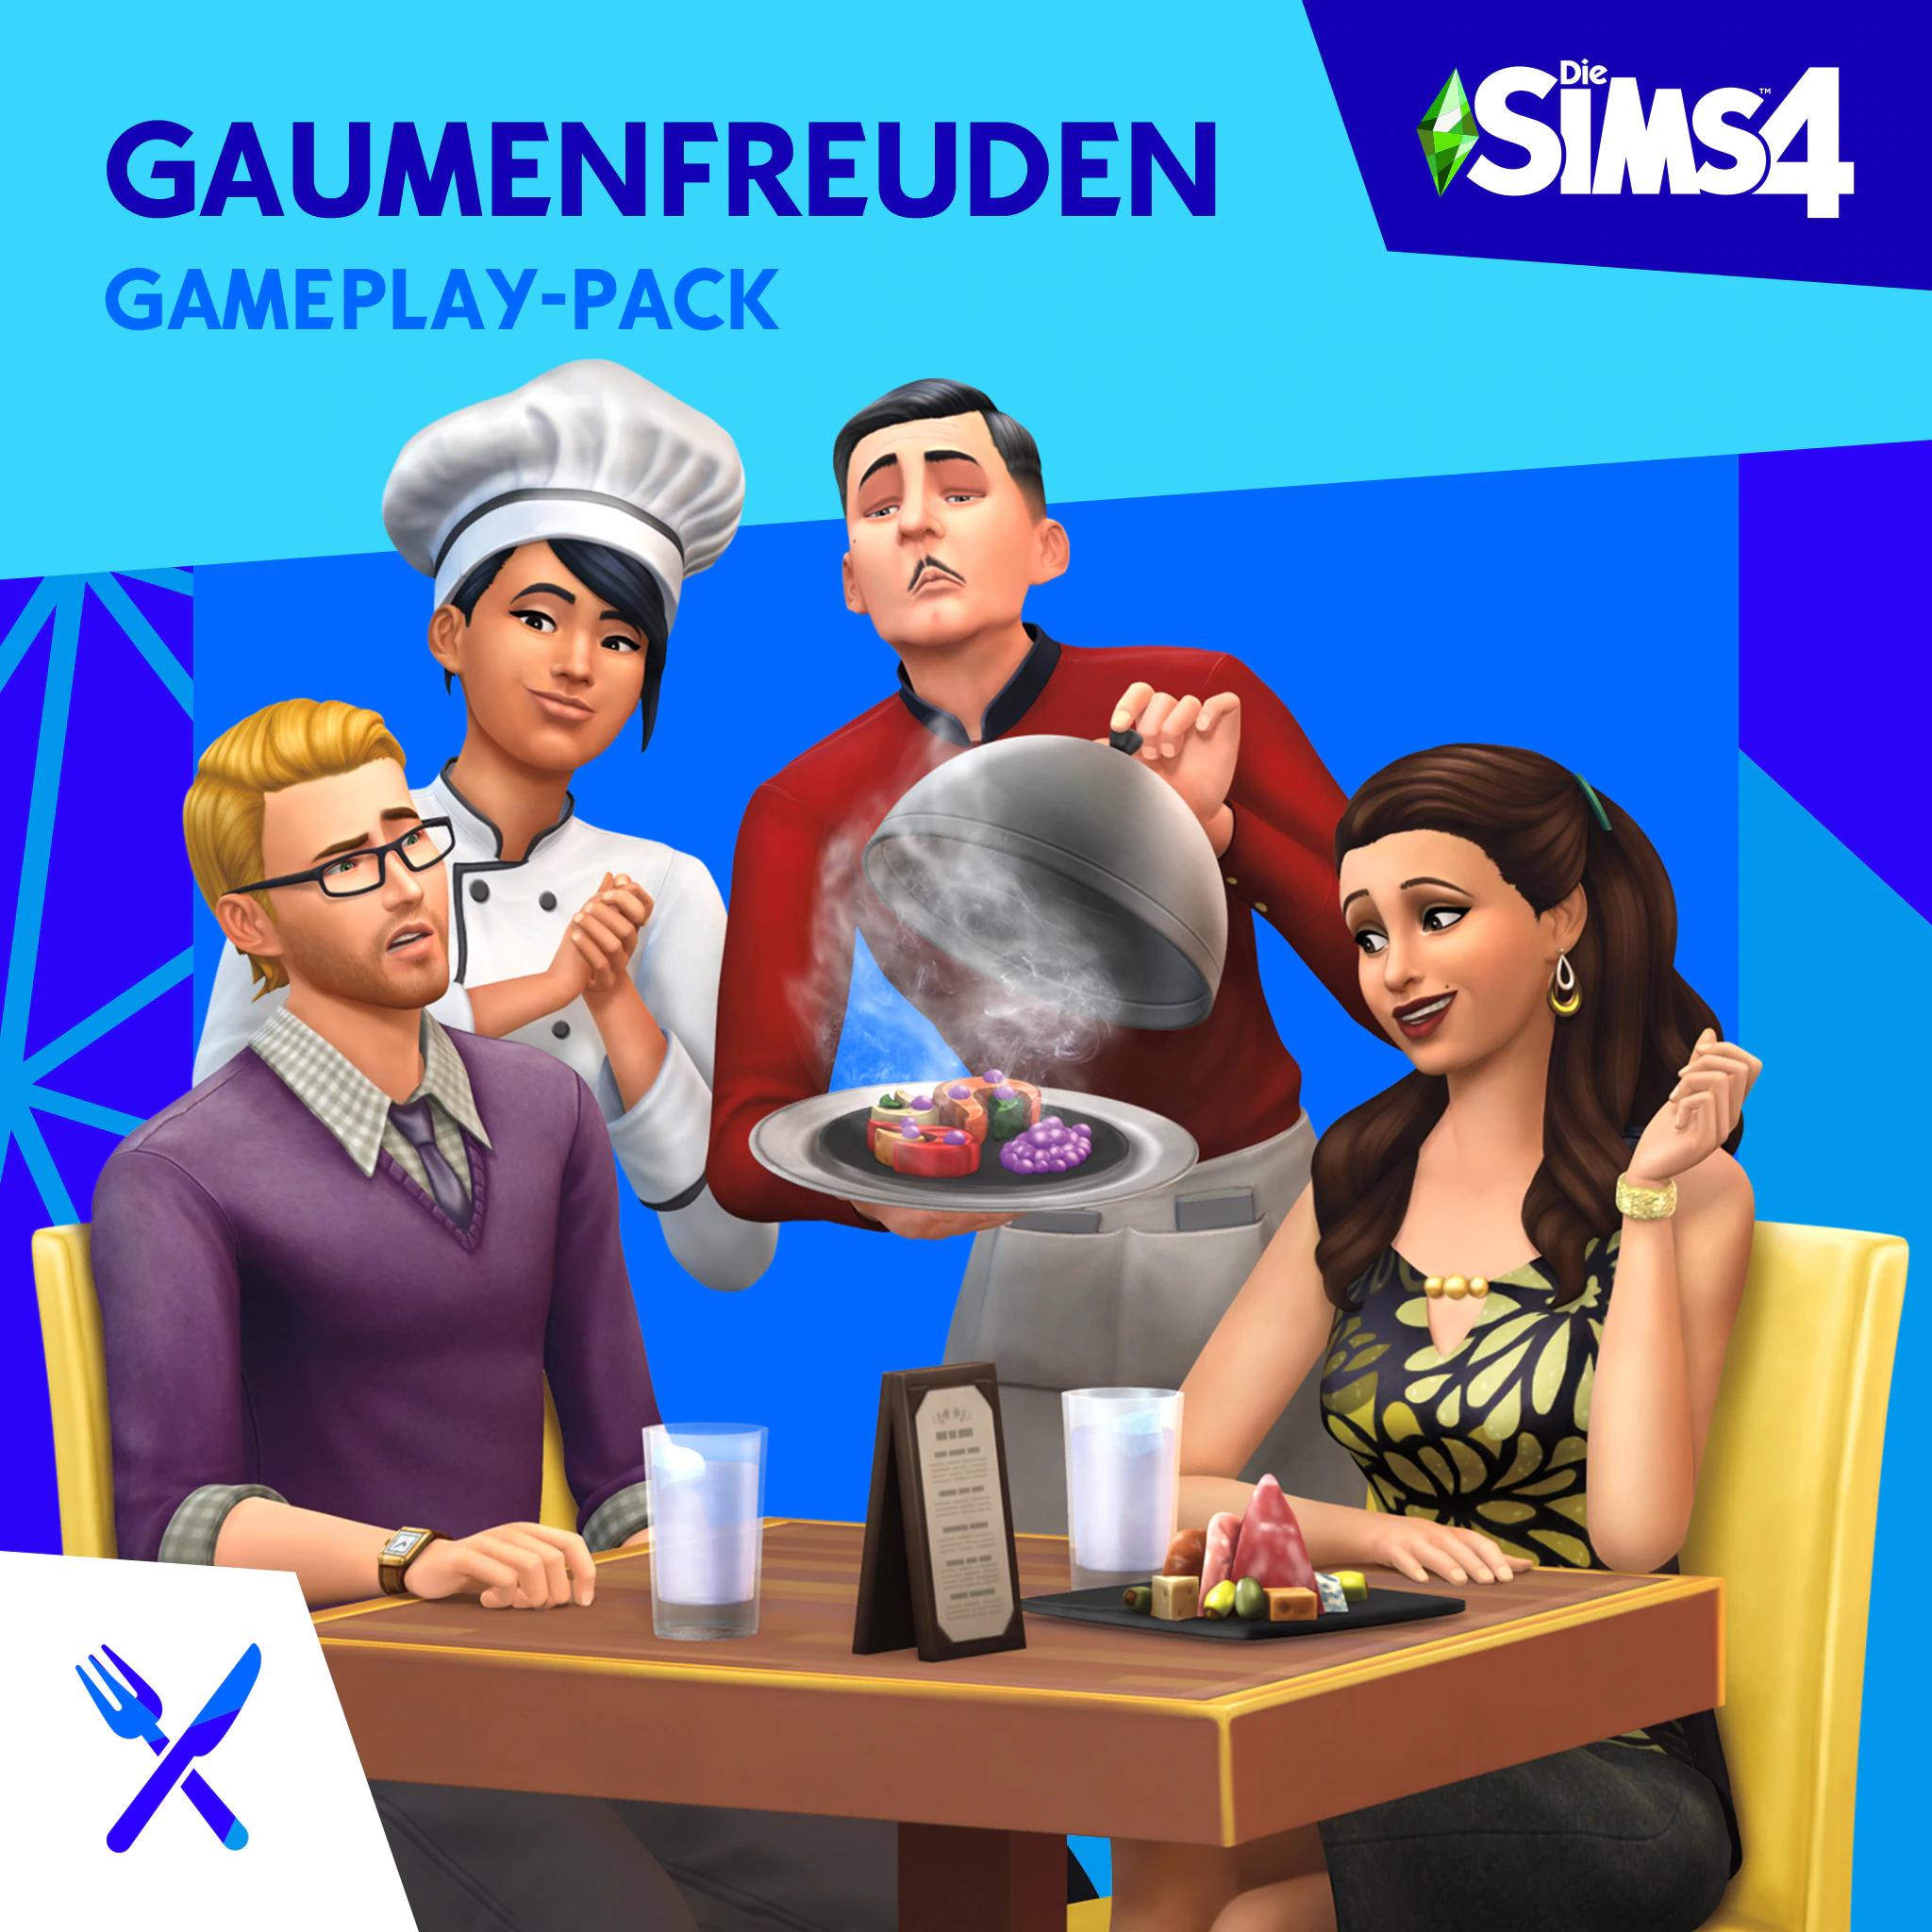 Gaumenfreuden / Dine out DLC für Sims 4 (PC/Mac - Origin-Store)